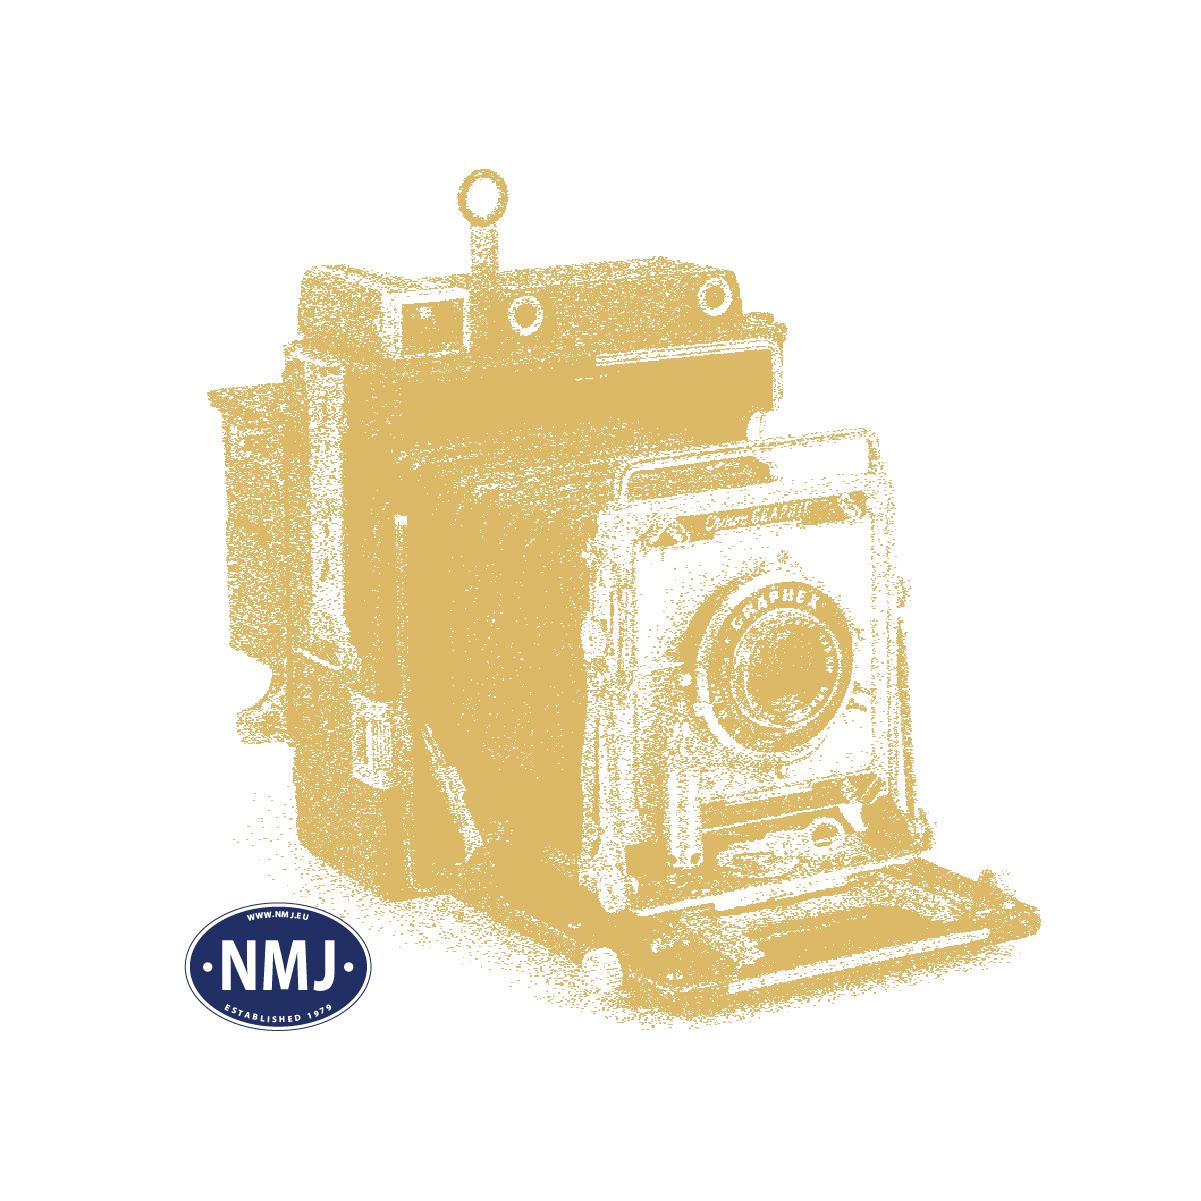 NMJT9911 - Speil og Stige for Grønn El13